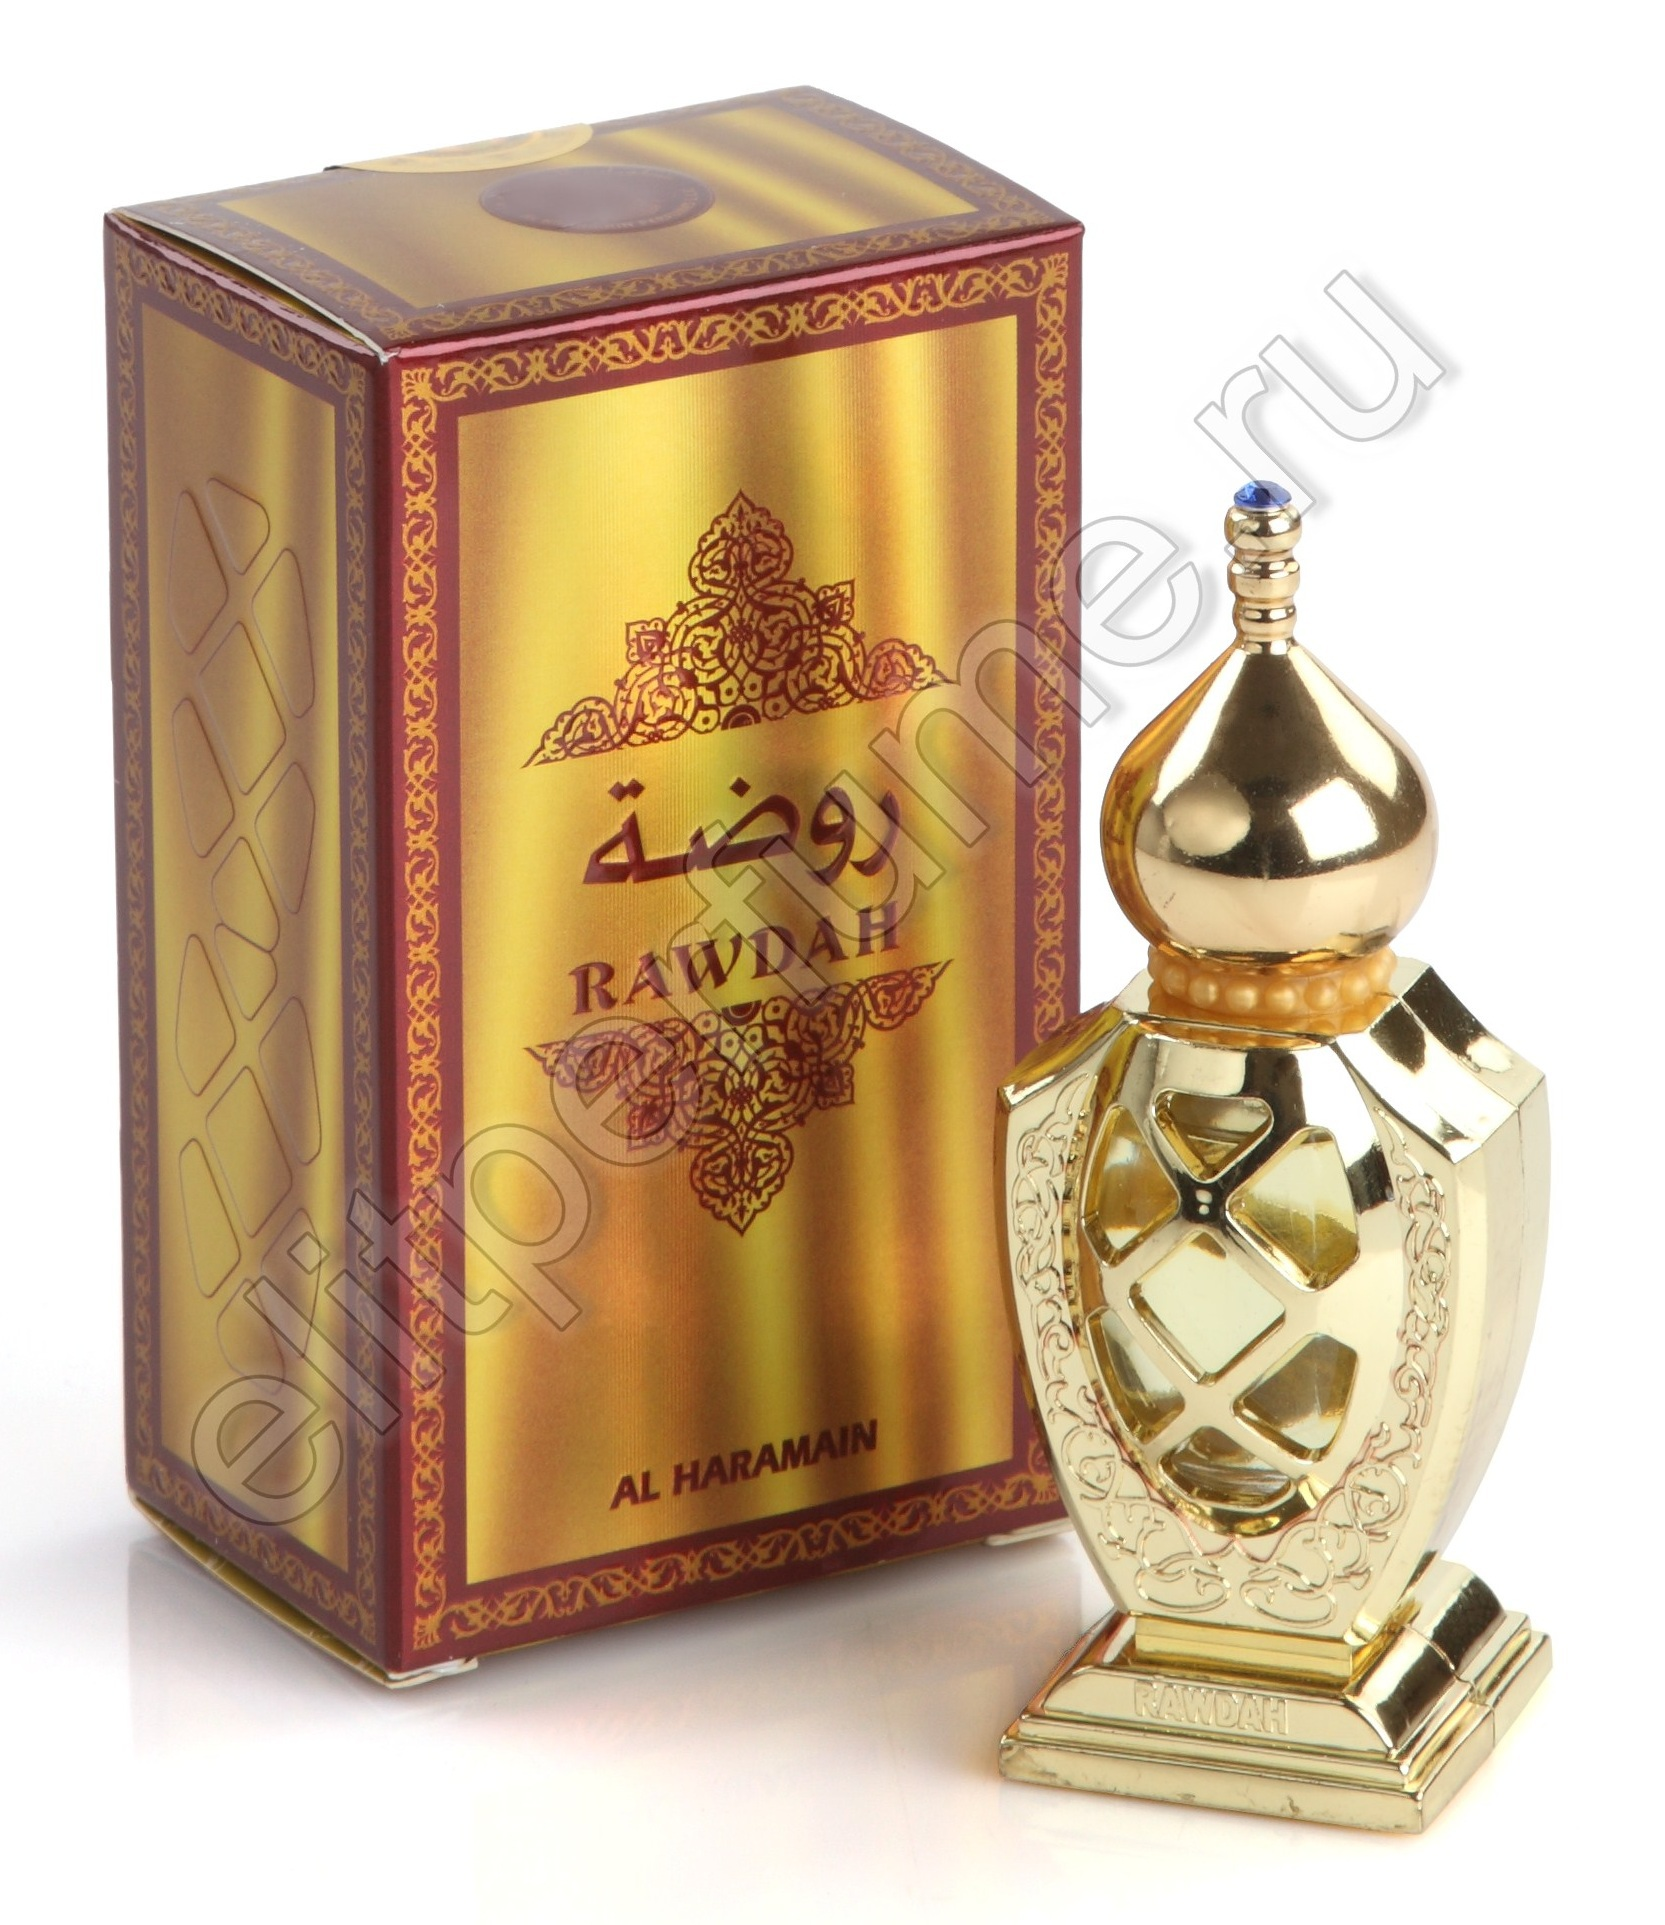 Рауда Rawdah 15 мл арабские масляные духи от Аль Харамайн Al Haramain Perfumes